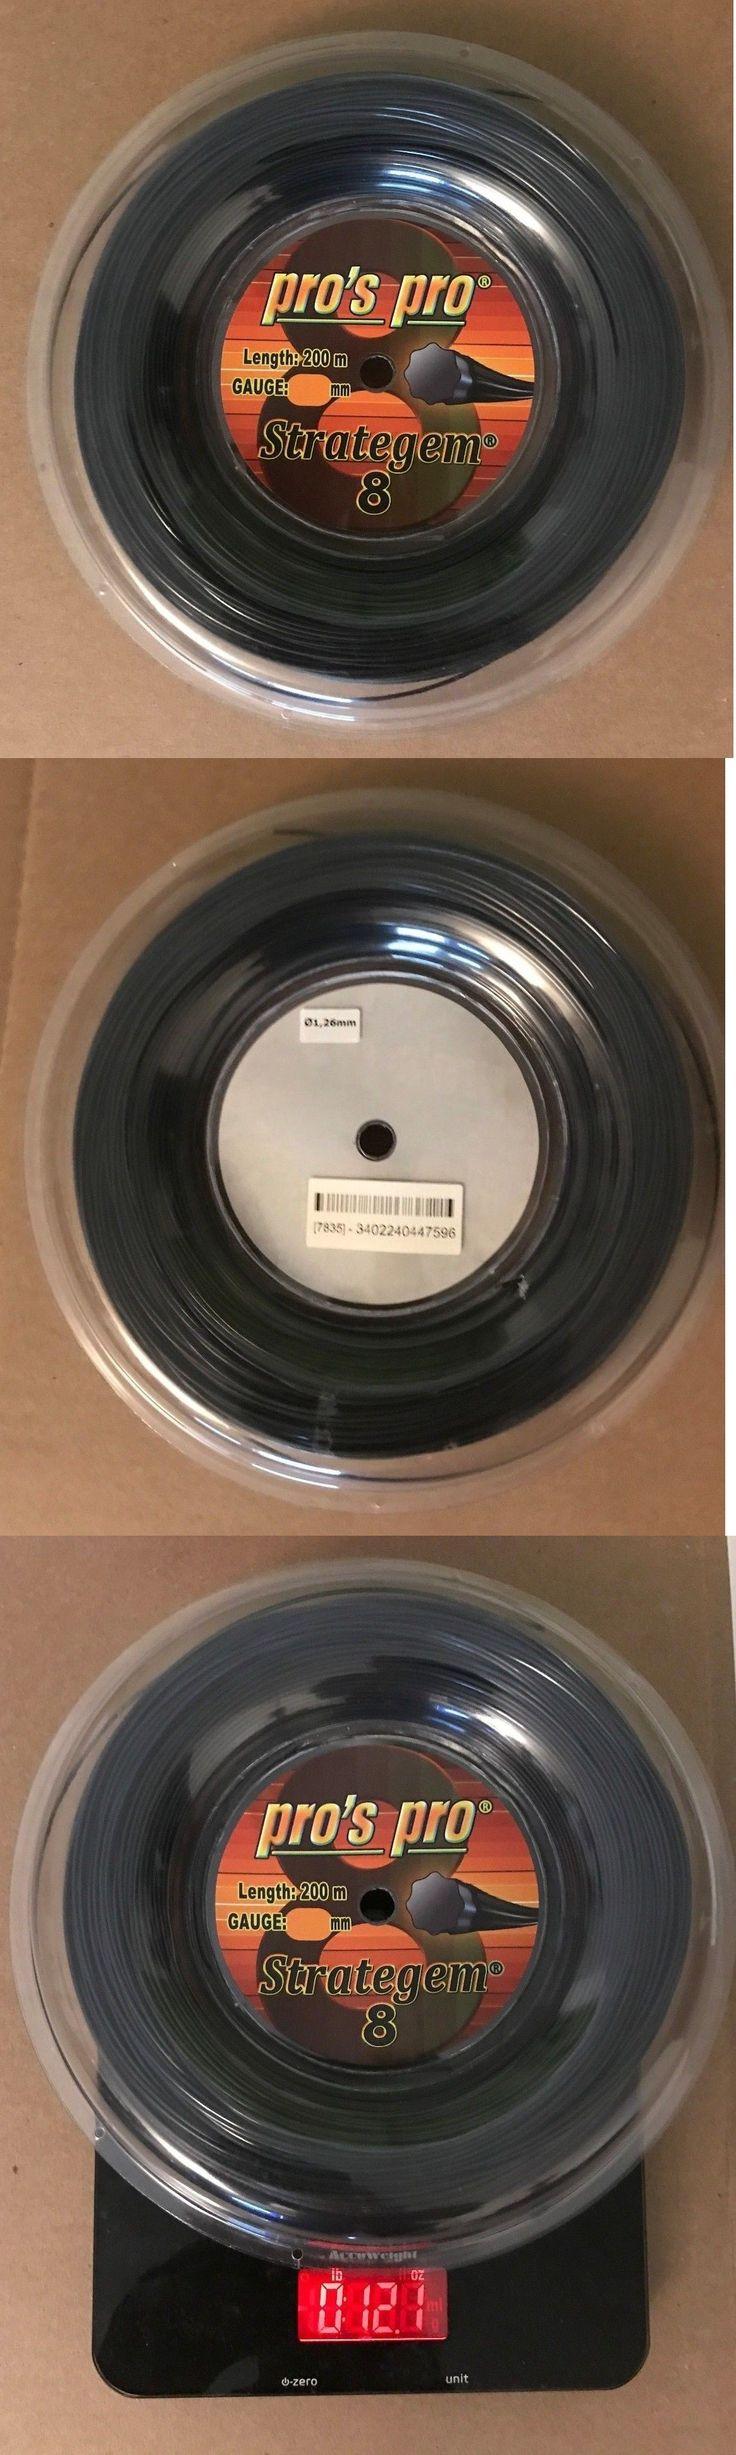 Strings 13343: Pro S Pro Strategem 8 1.25Mm Tennis String Reel 660Ft 200M -> BUY IT NOW ONLY: $60 on eBay!